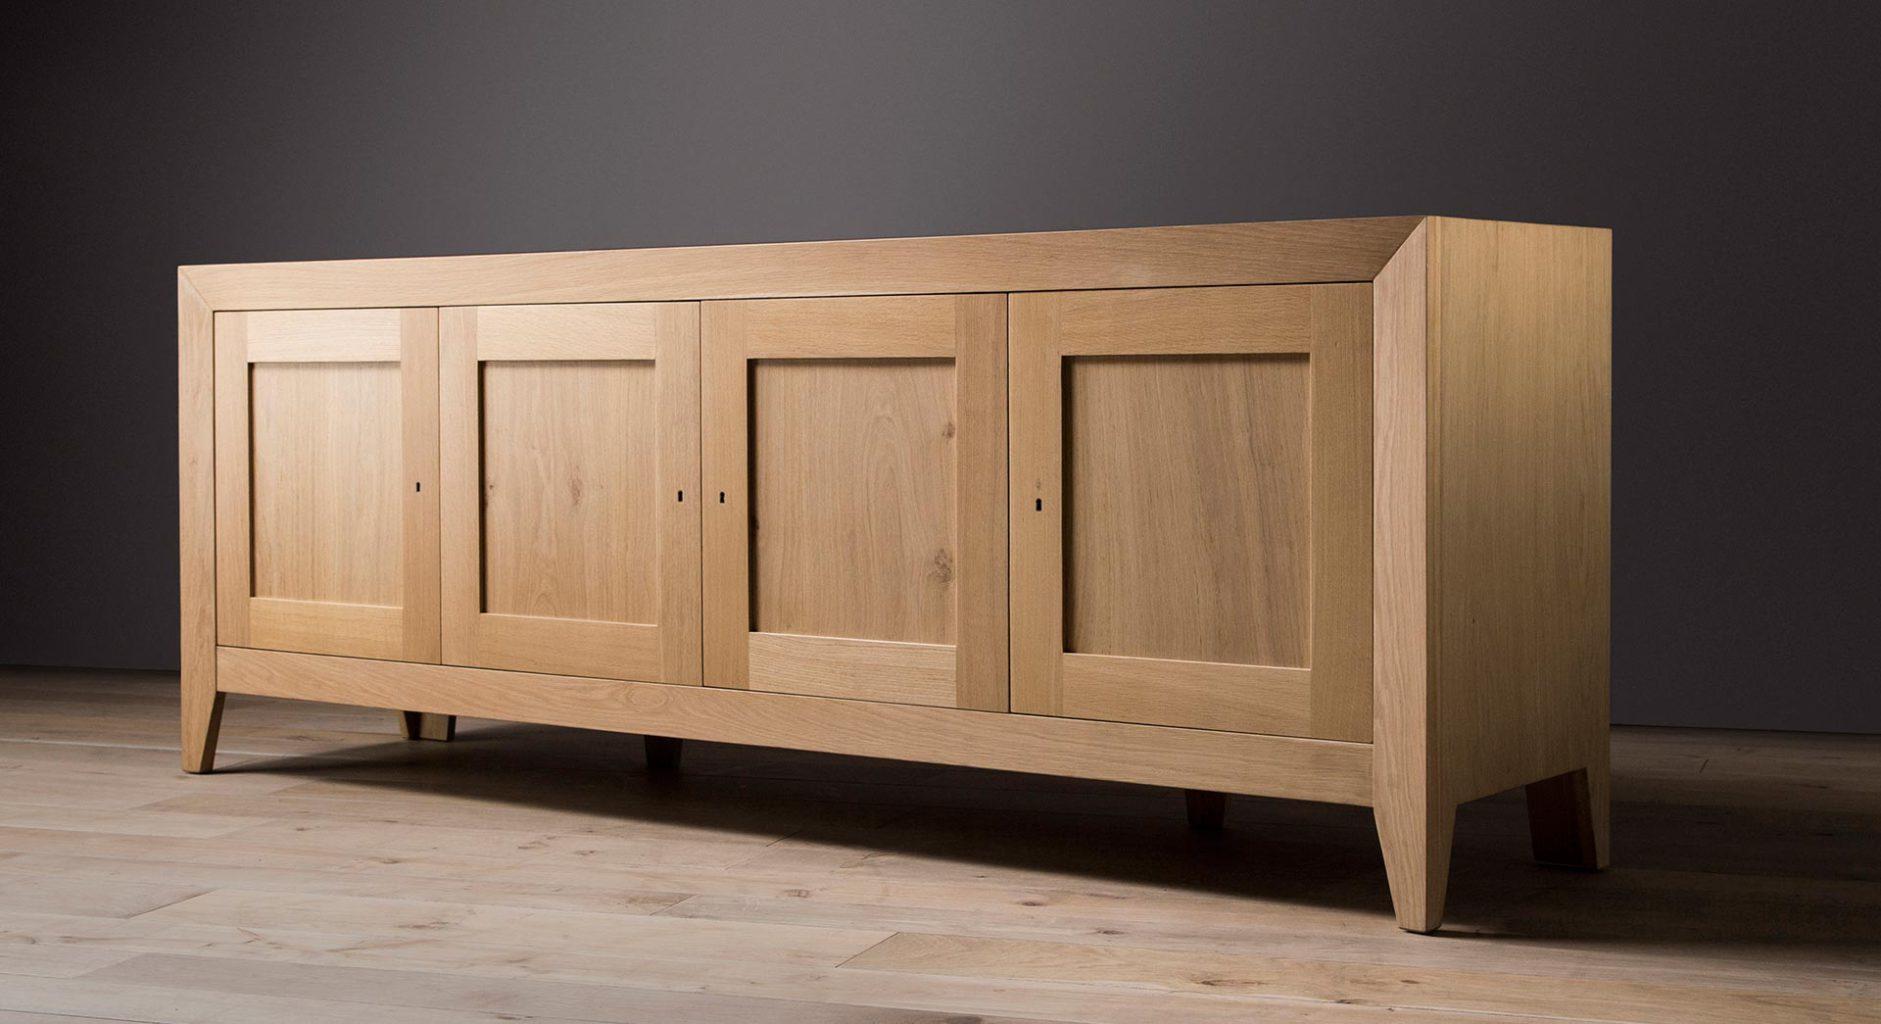 Solid wood Europa sideboard in french oak made by Pierre Cronje